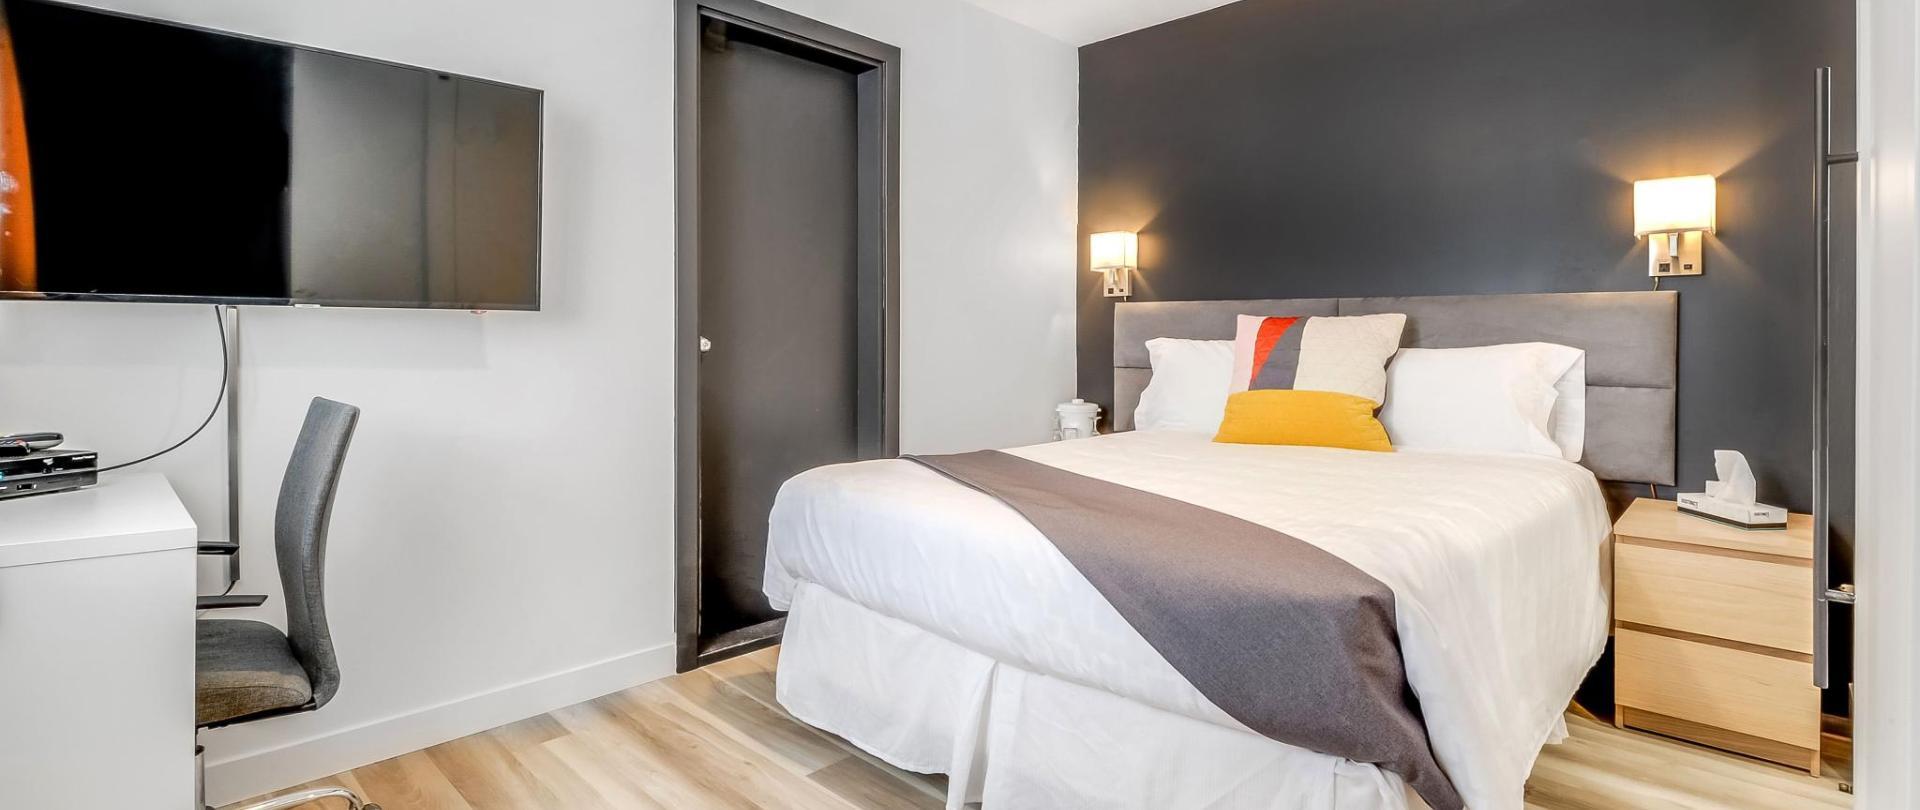 chambre #9 motel levis .jpg